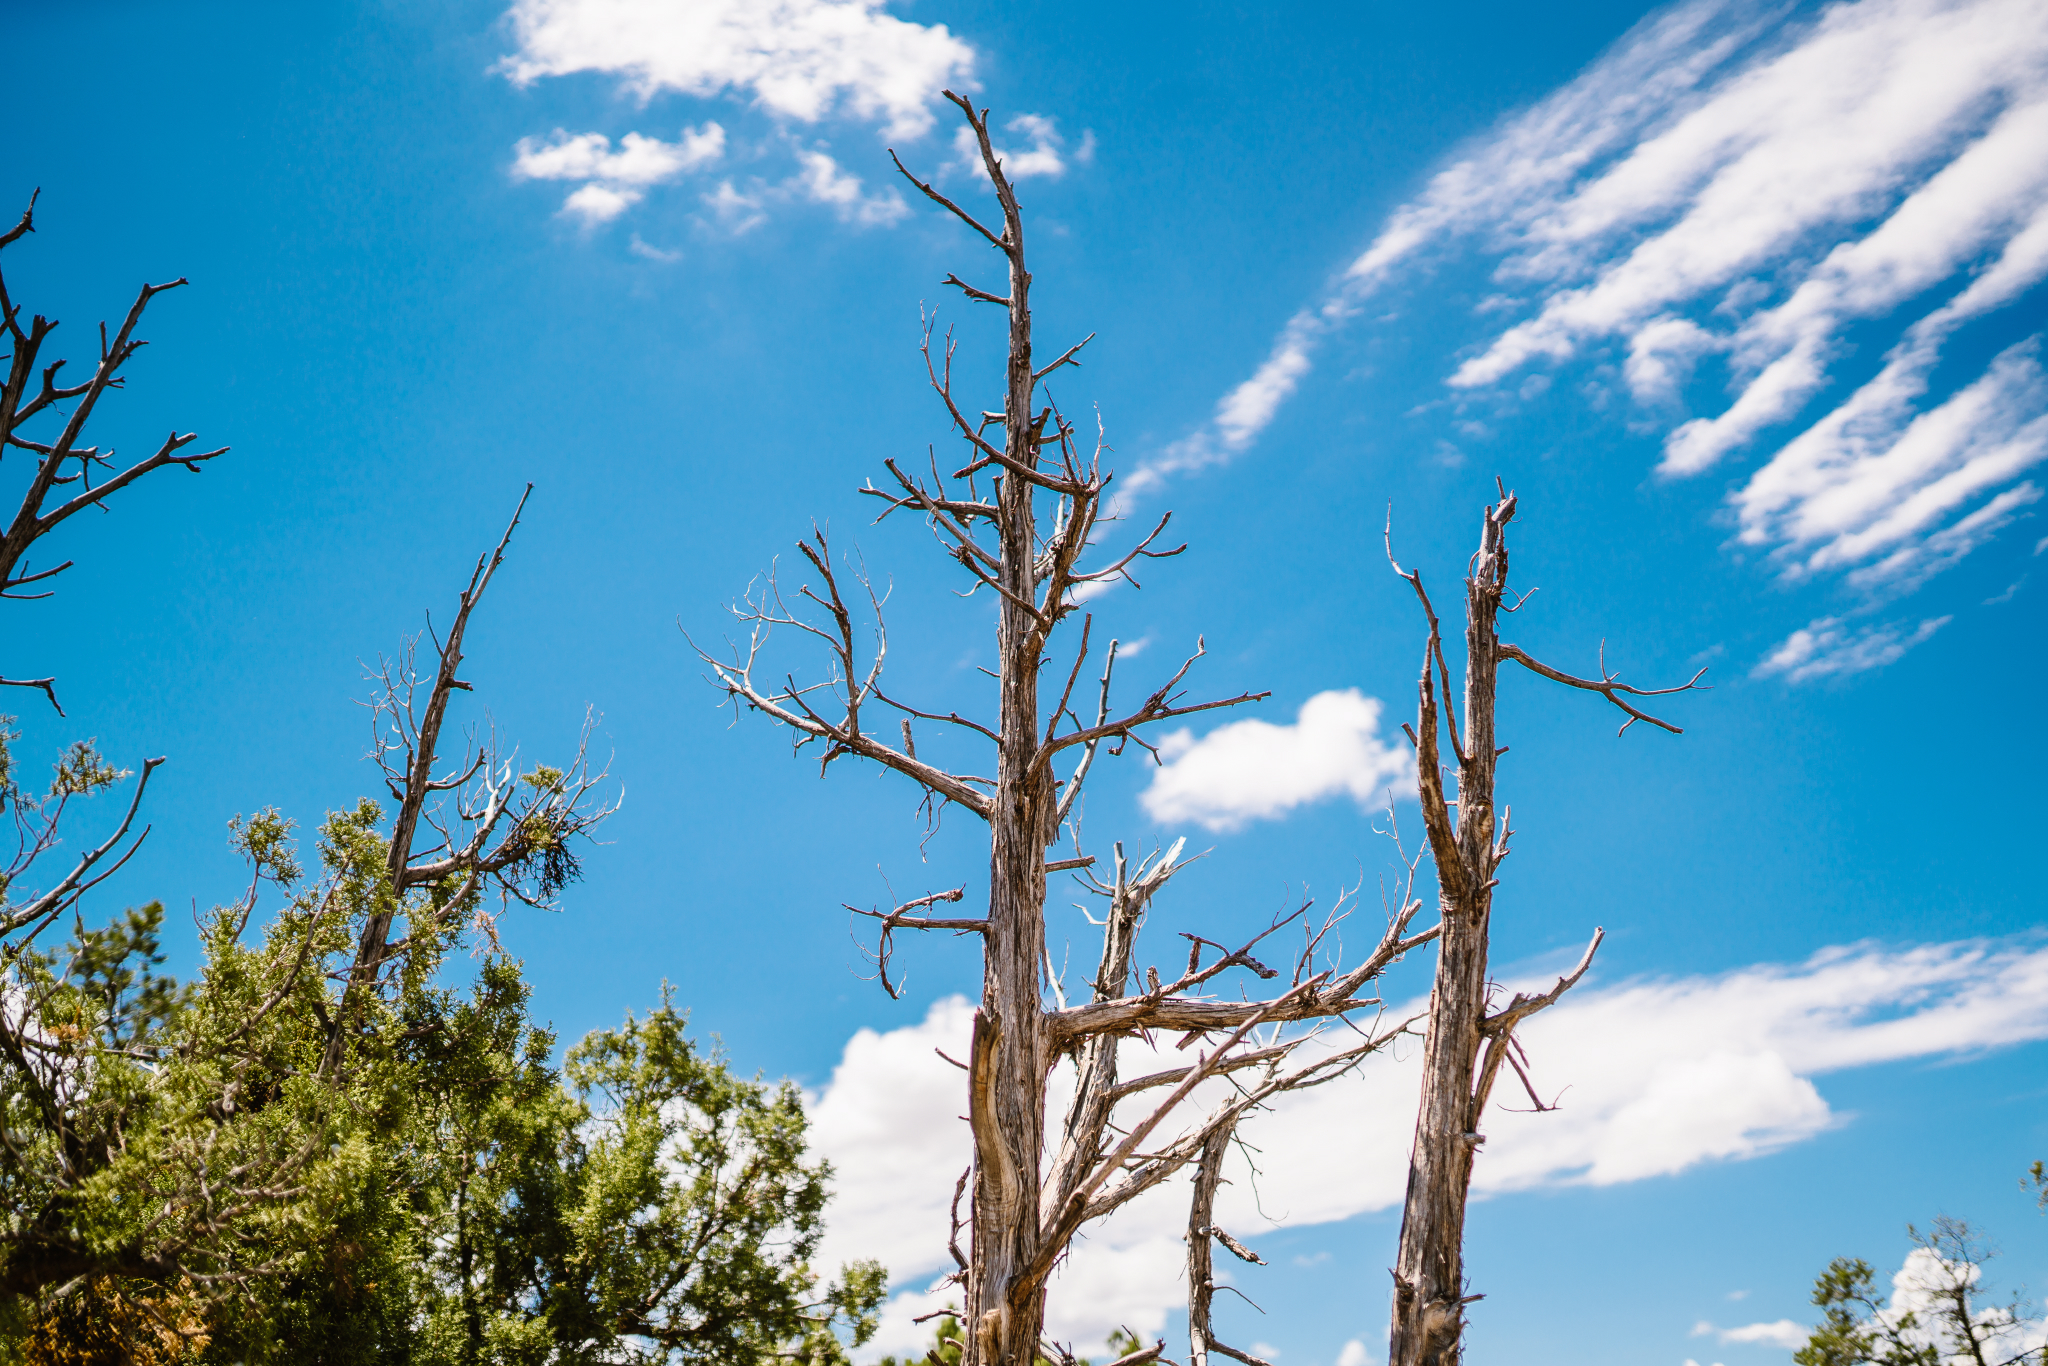 san diego wedding   photographer | dead tree branches against blue sky